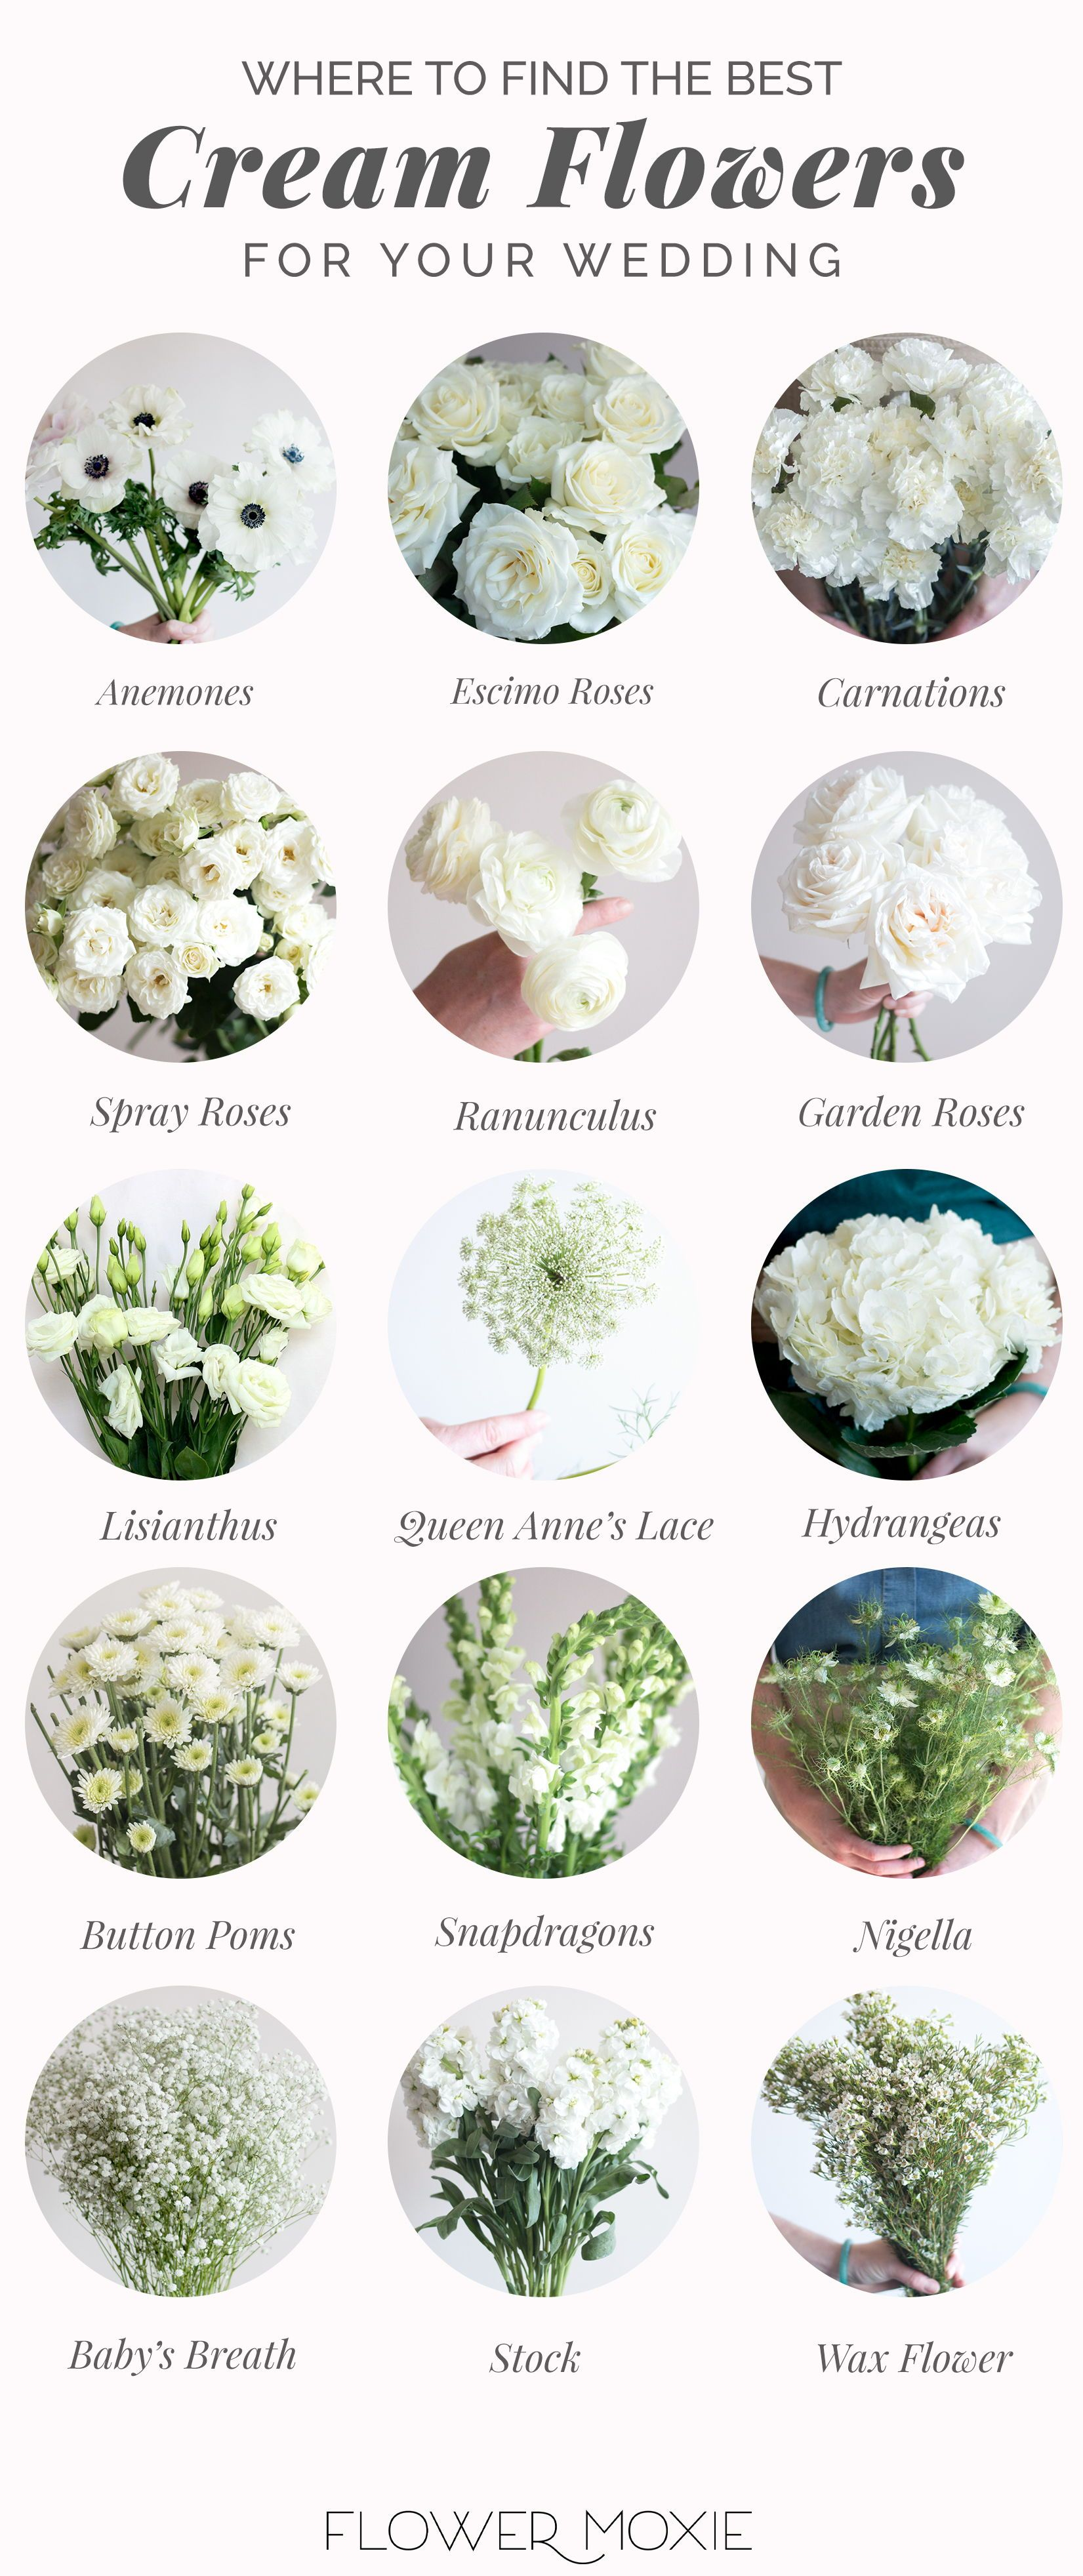 Cream And White Wedding Flowers Bulk Fresh Wedding Flowers In 2020 Wedding Flower Packages Cream Wedding Flowers White Wedding Flowers